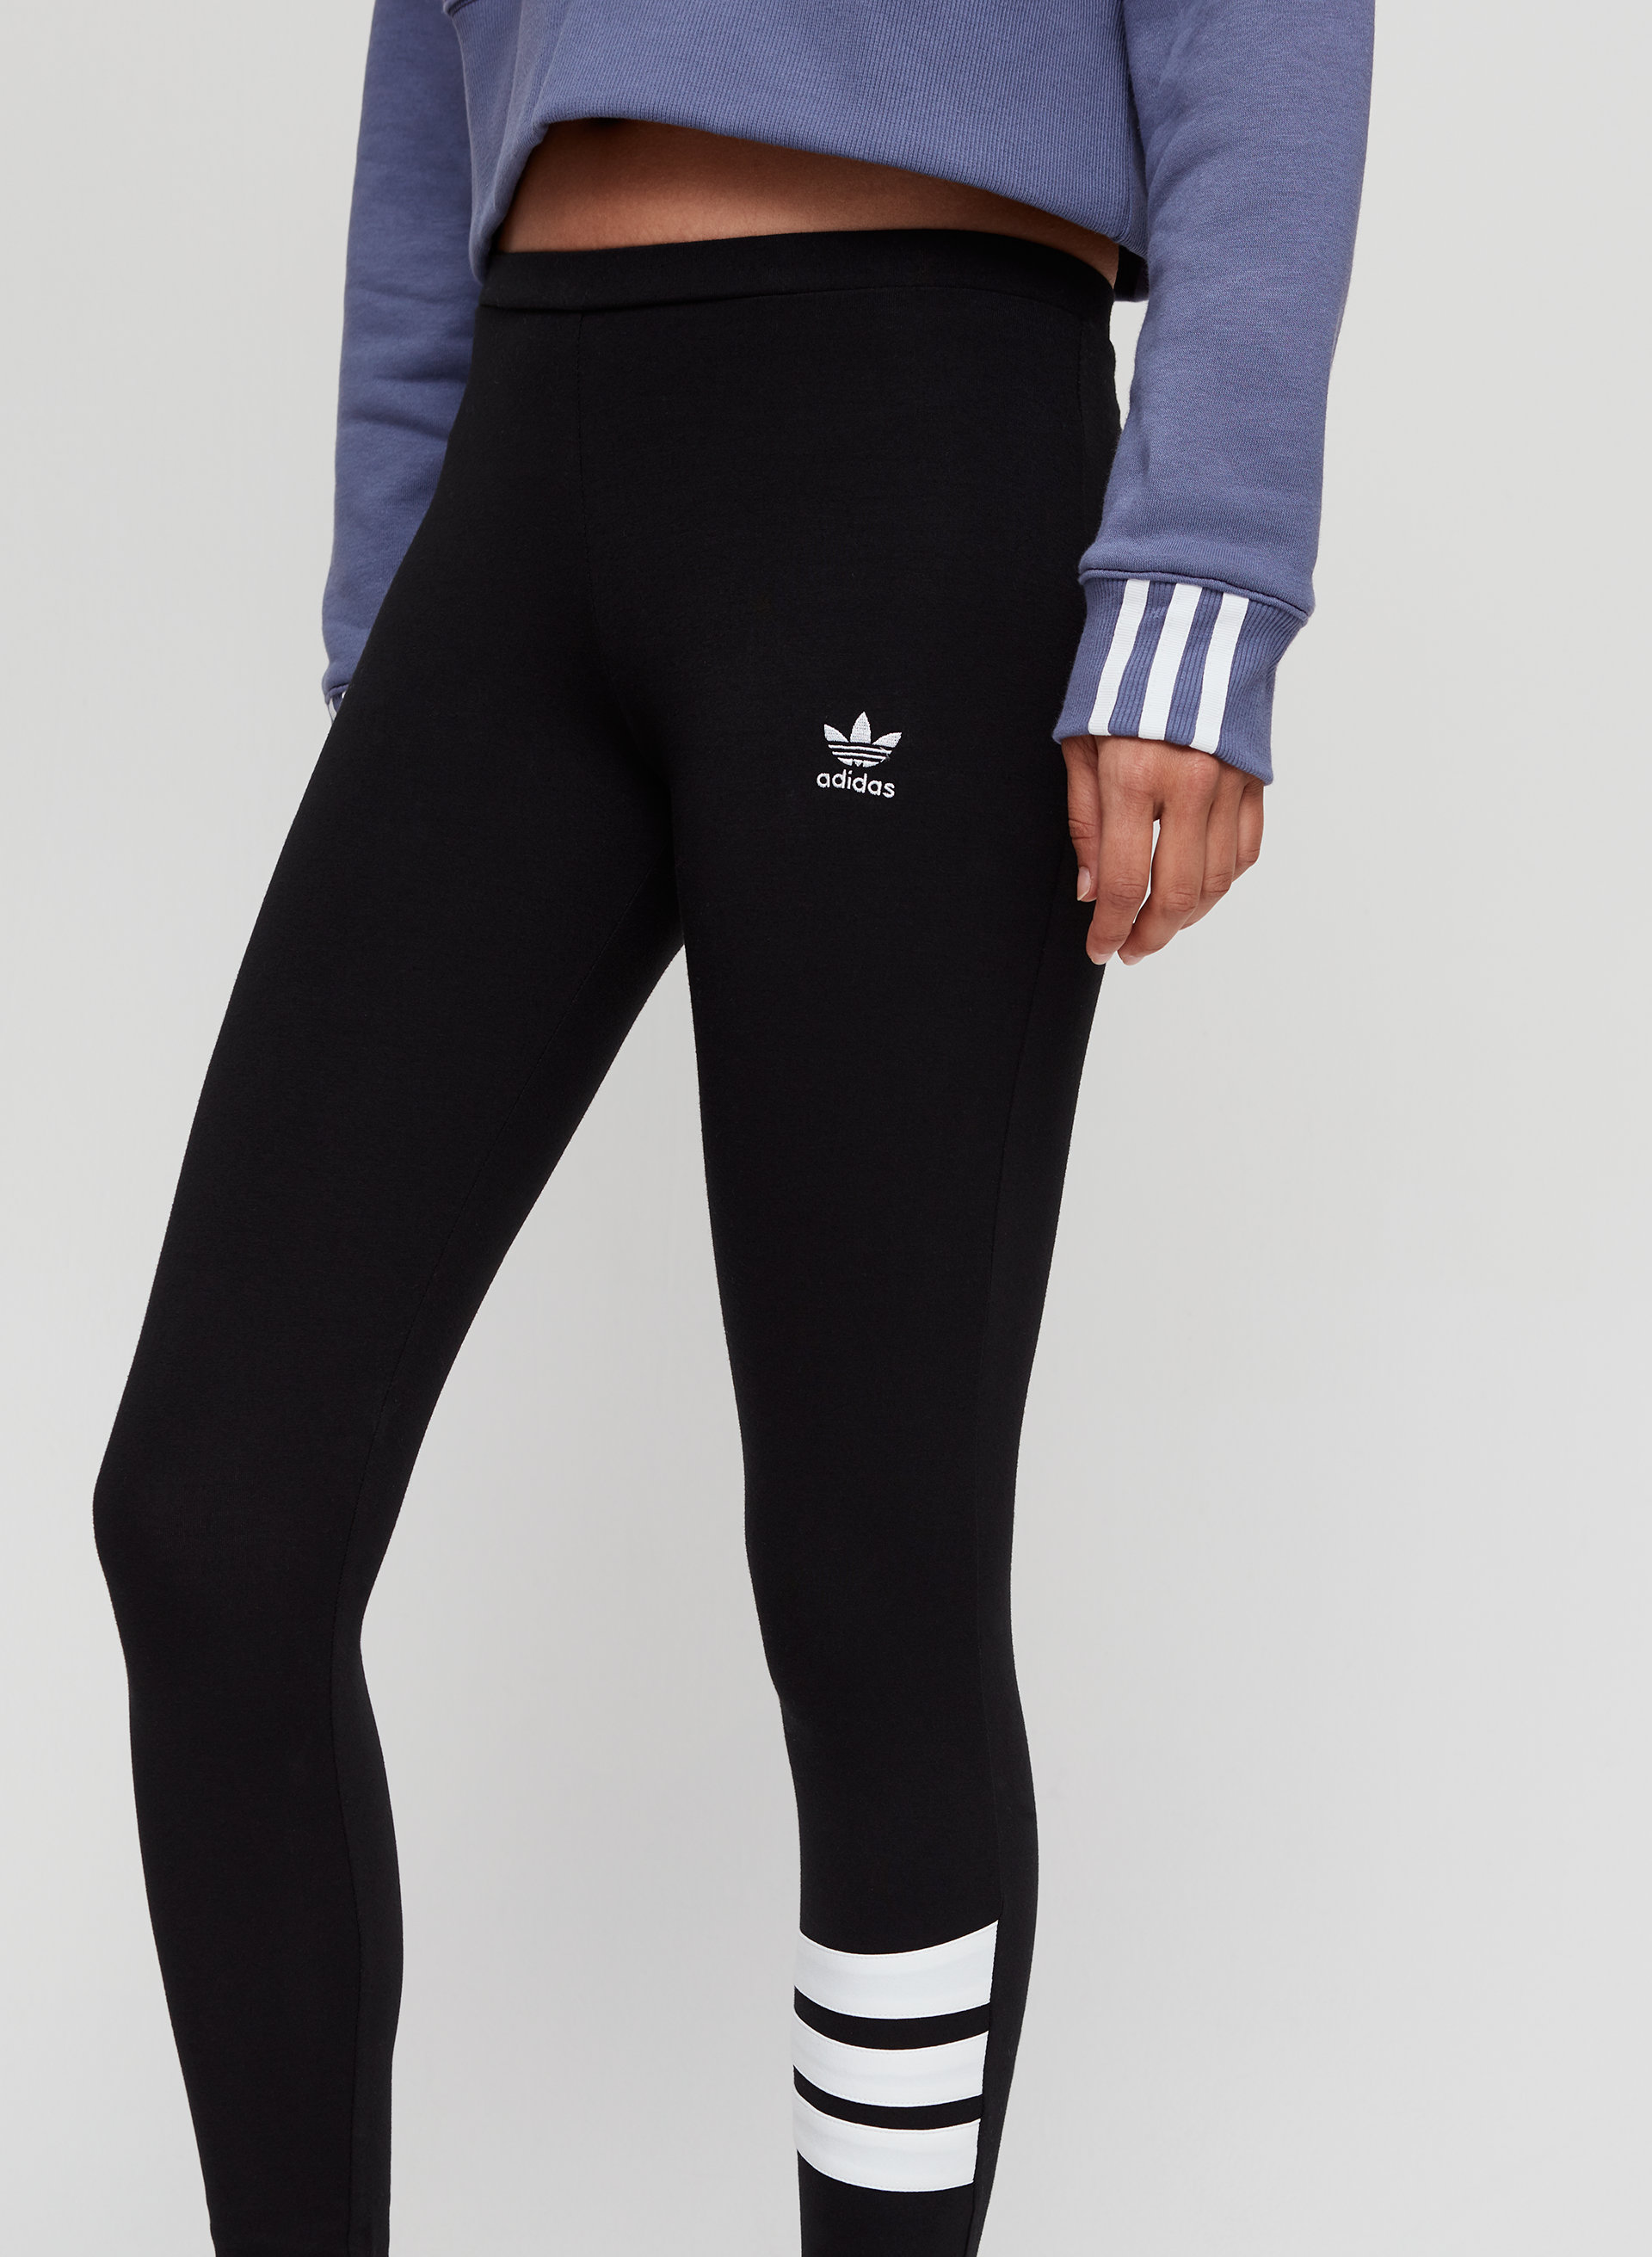 adidas leggings xxs